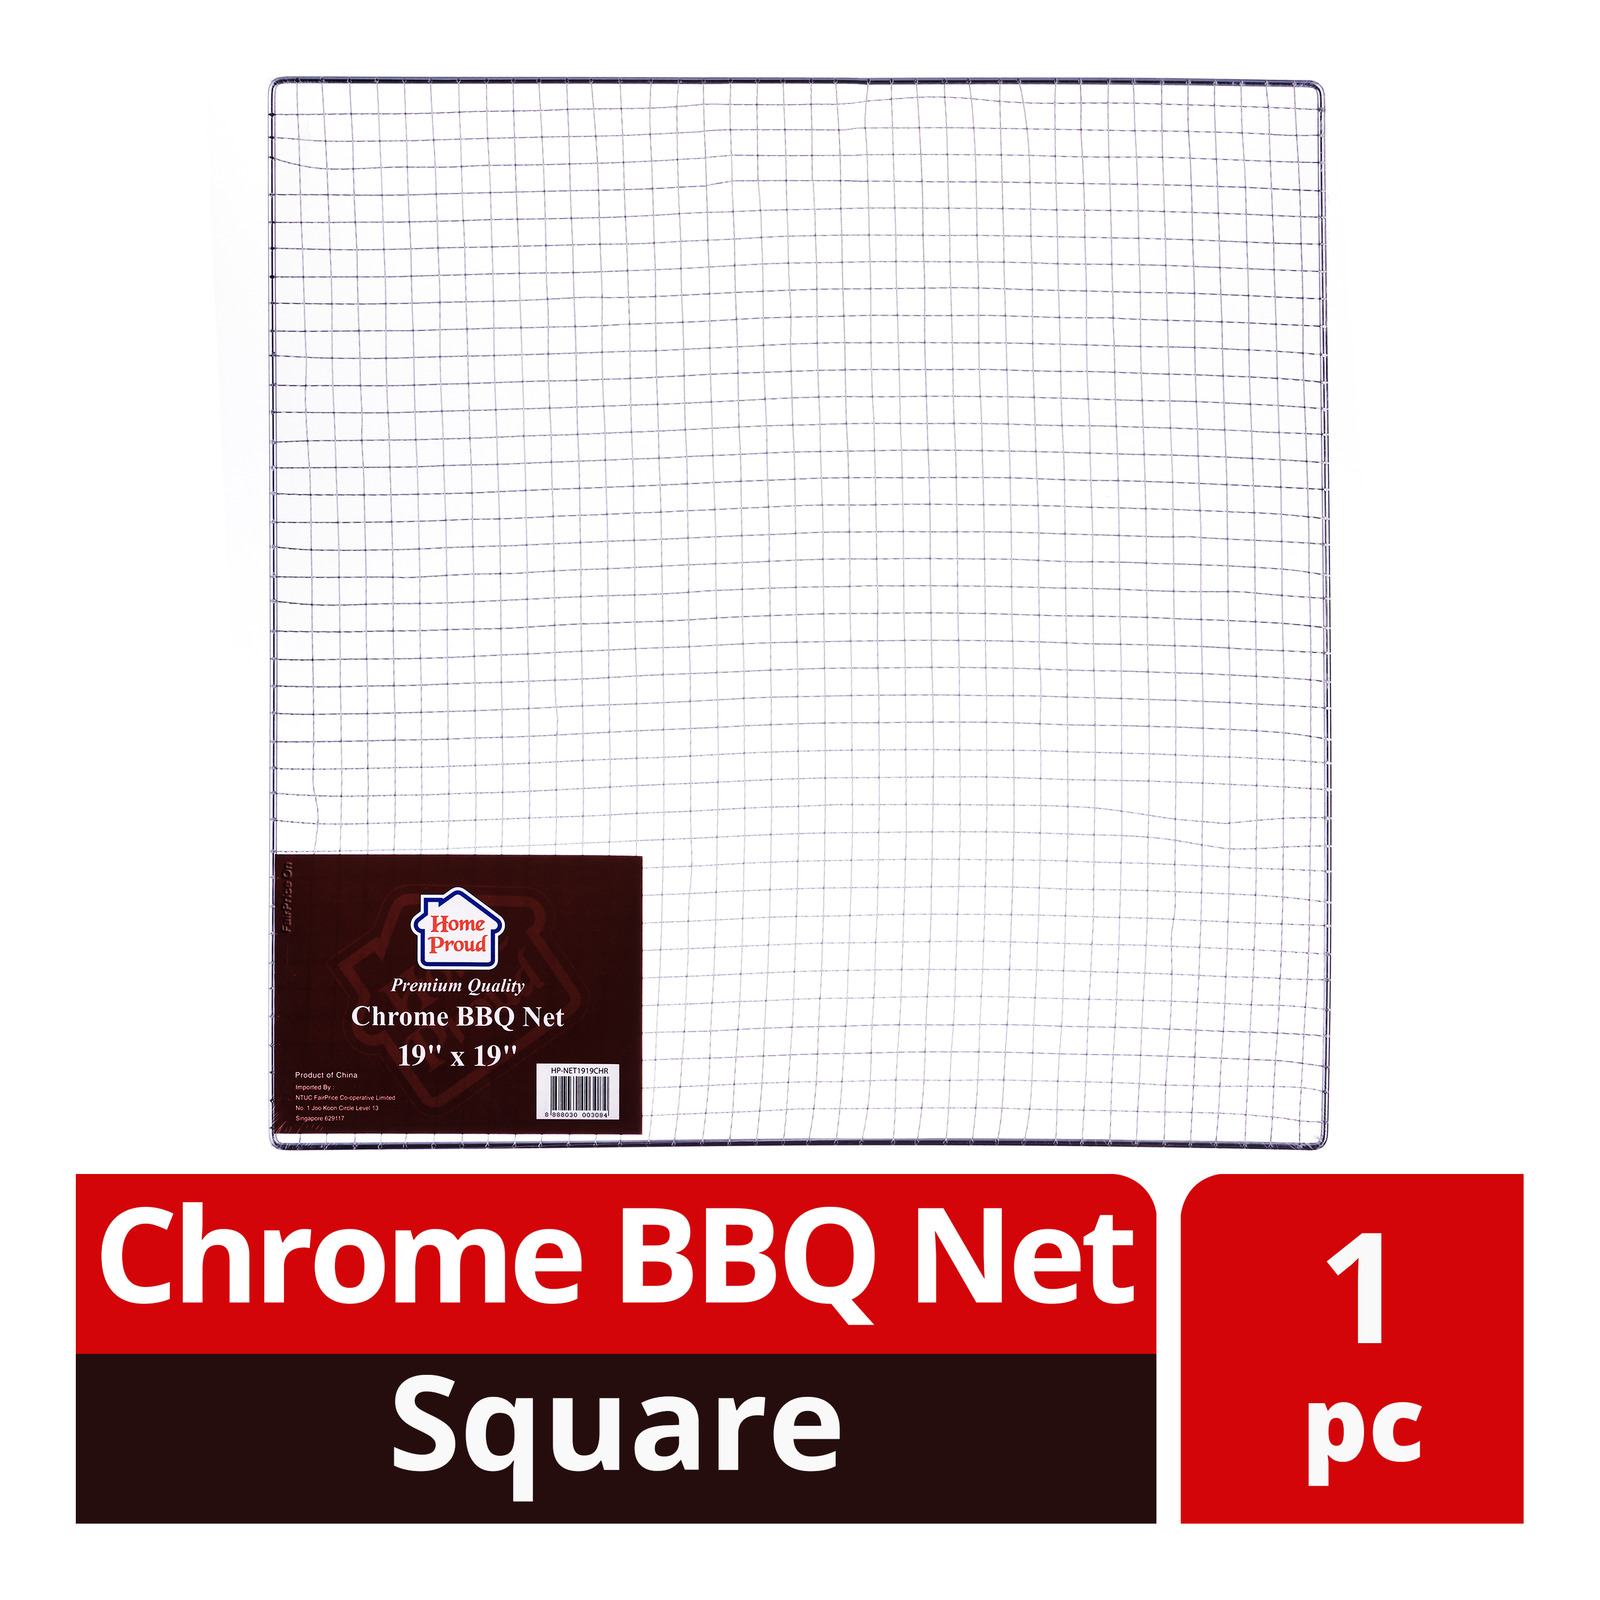 HomeProud Chrome BBQ Net - Square